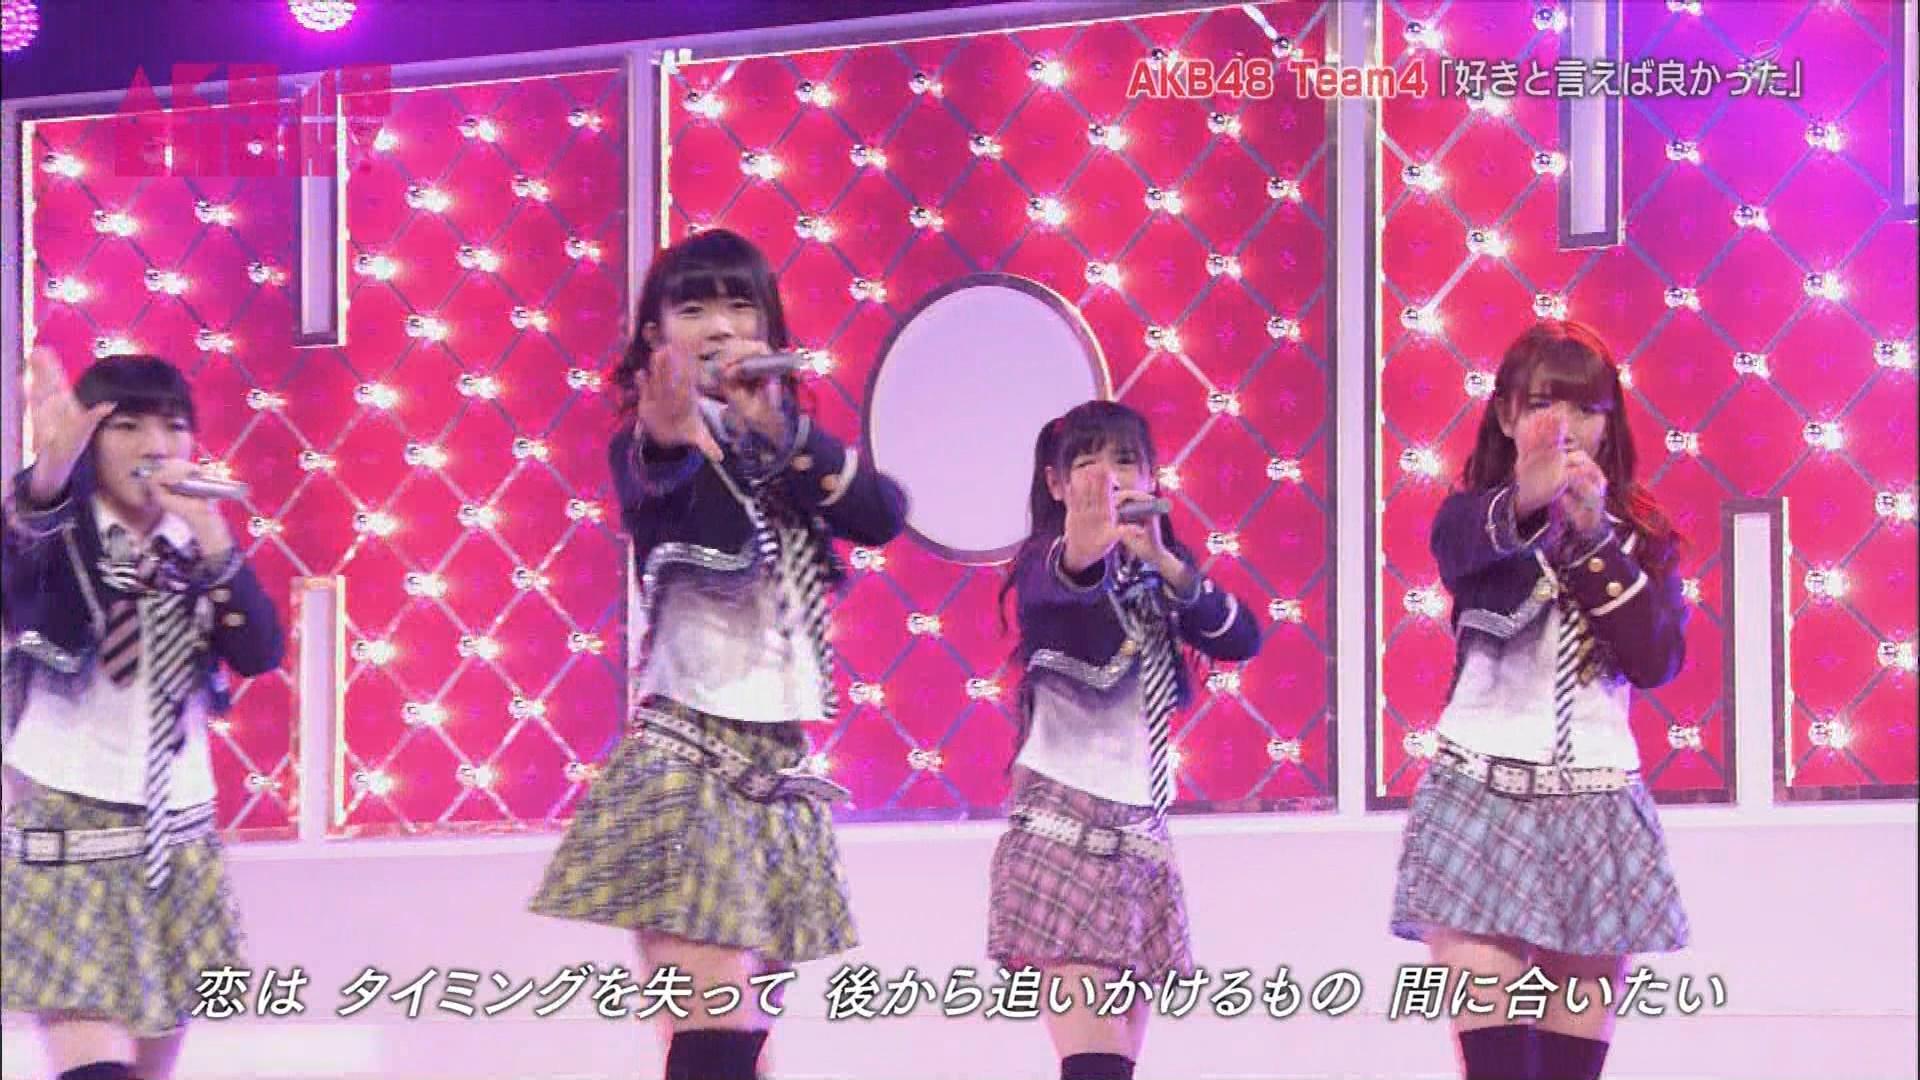 AKB48SHOW チーム4好きといえば良かった 加藤玲奈 20140830 (6)